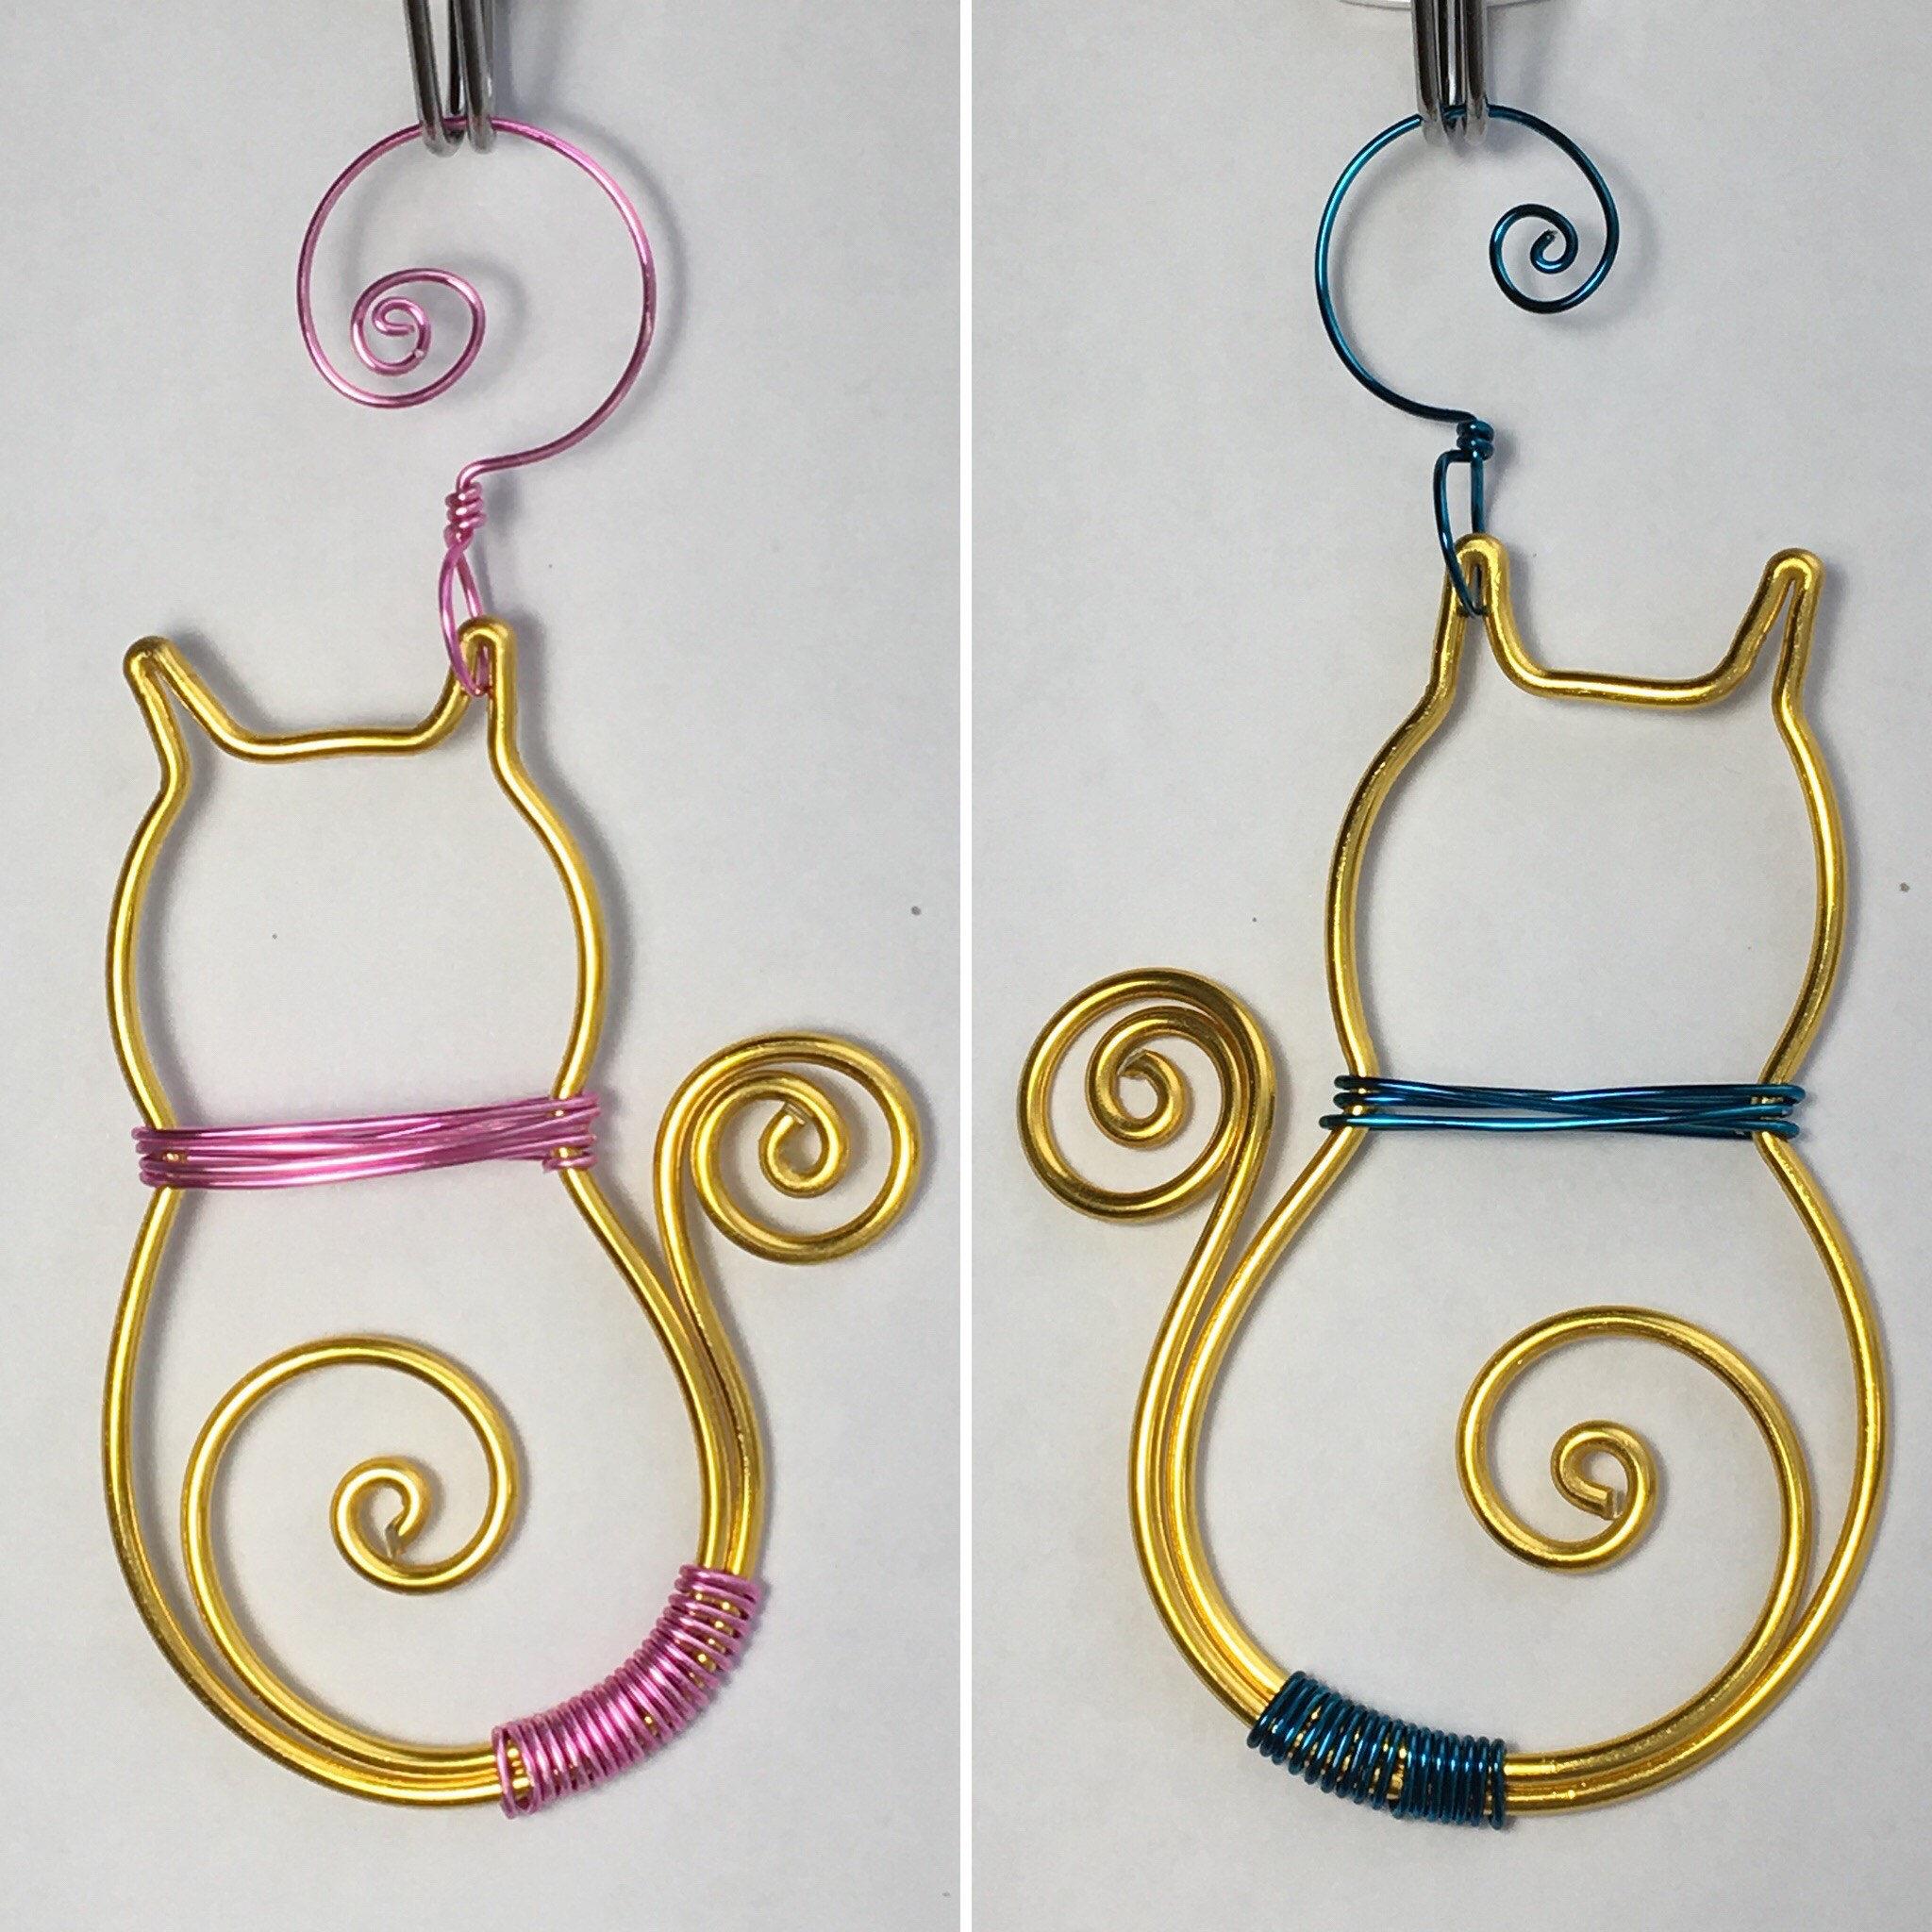 Yellow-colored Aluminum Wire Cat Ornament